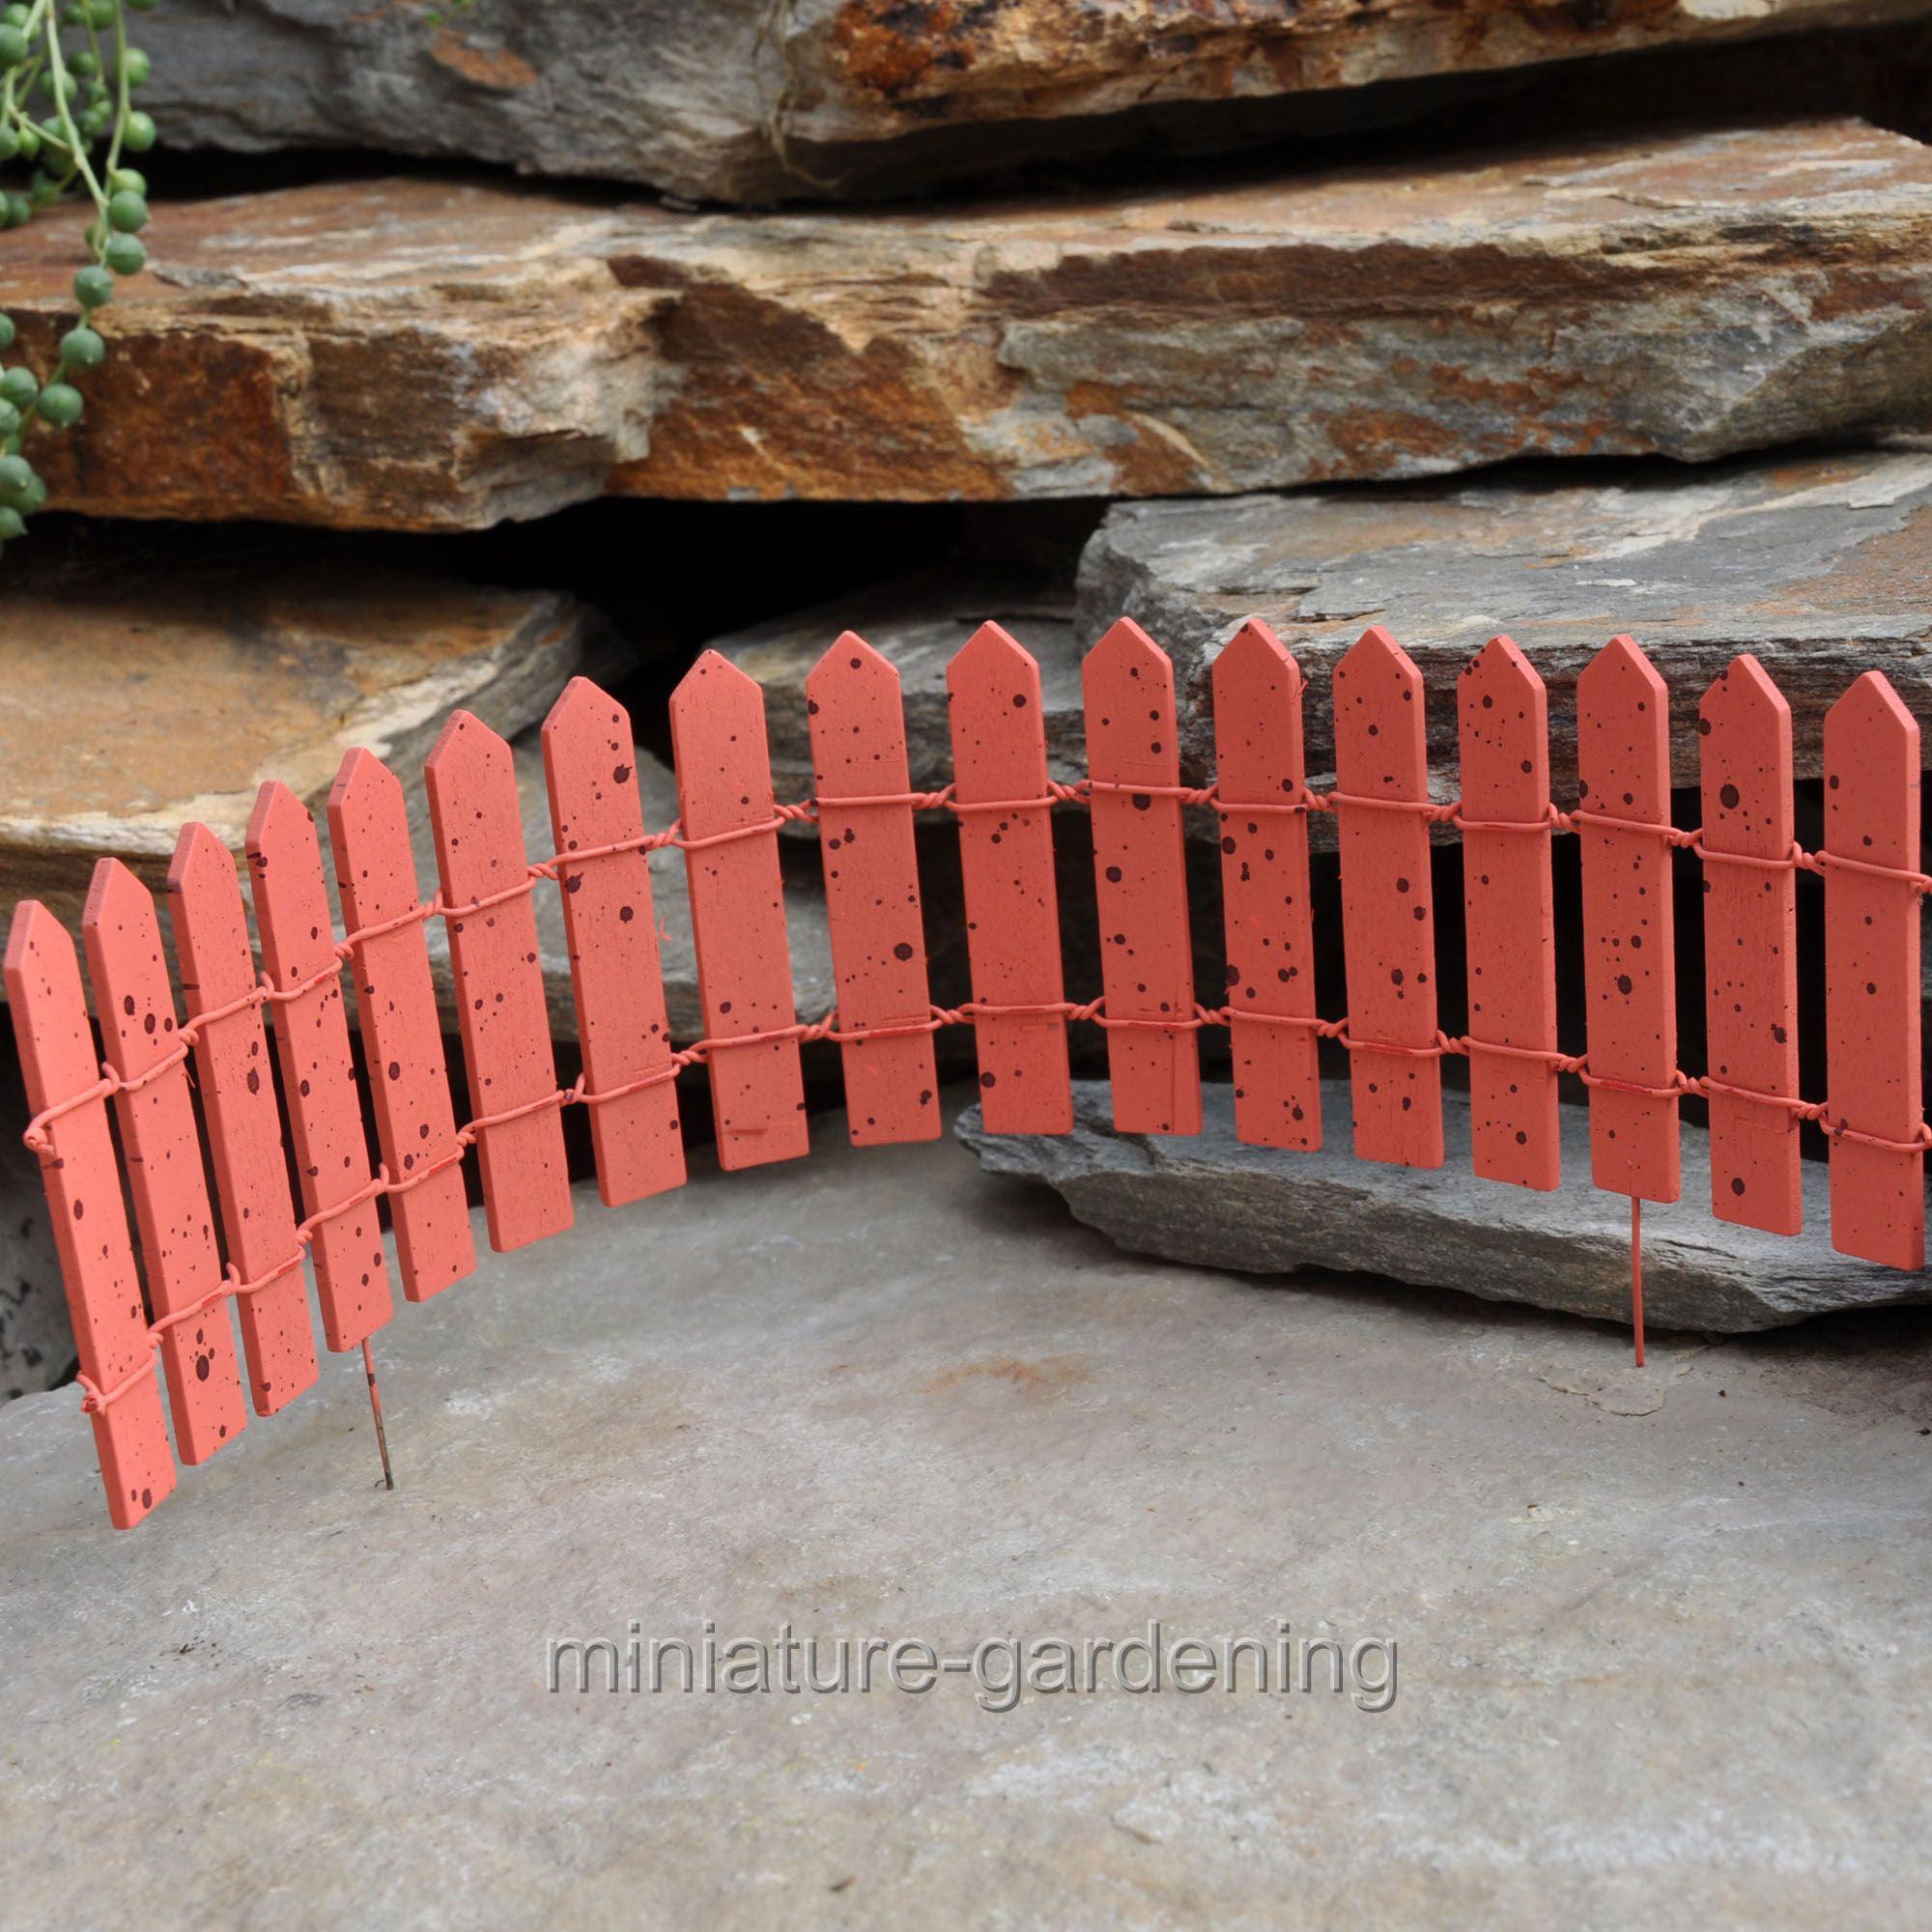 Wholesale Fairy Gardens Cheerful Fairy Fence, Color Options for Miniature Garden, Fairy Garden